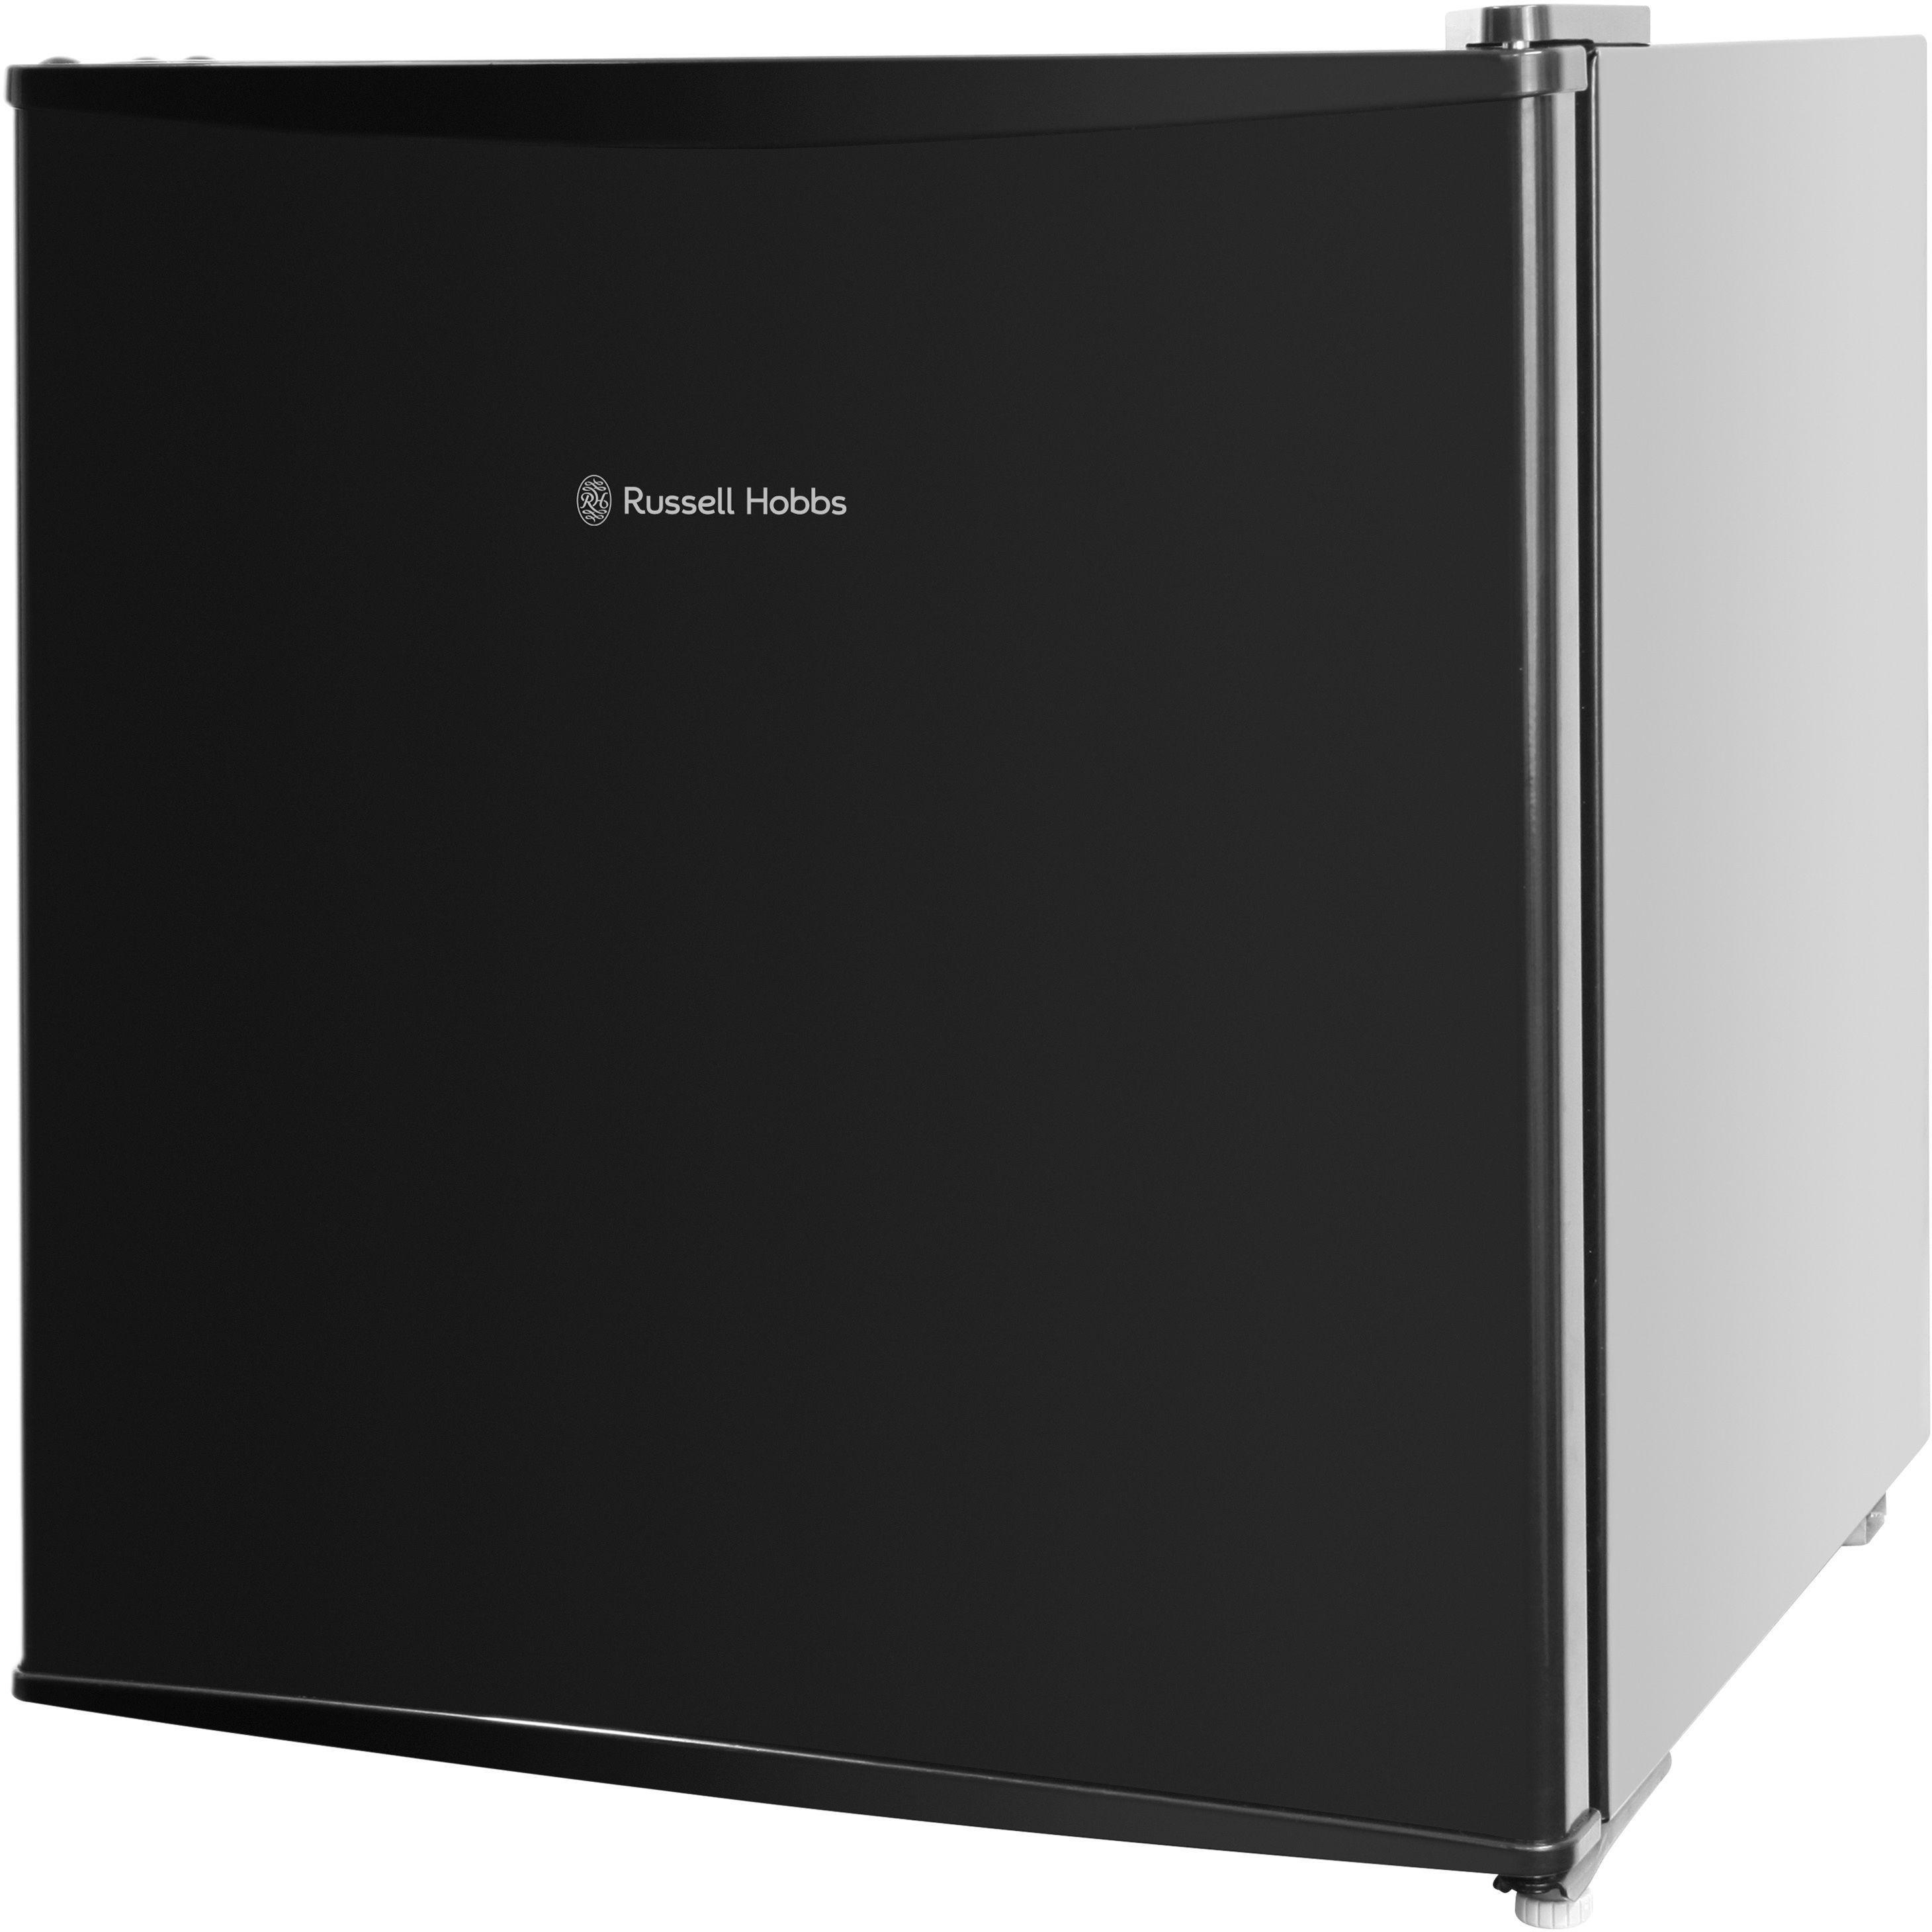 Sale On Russell Hobbs Rhttfz1b Tabletop Freezer Black